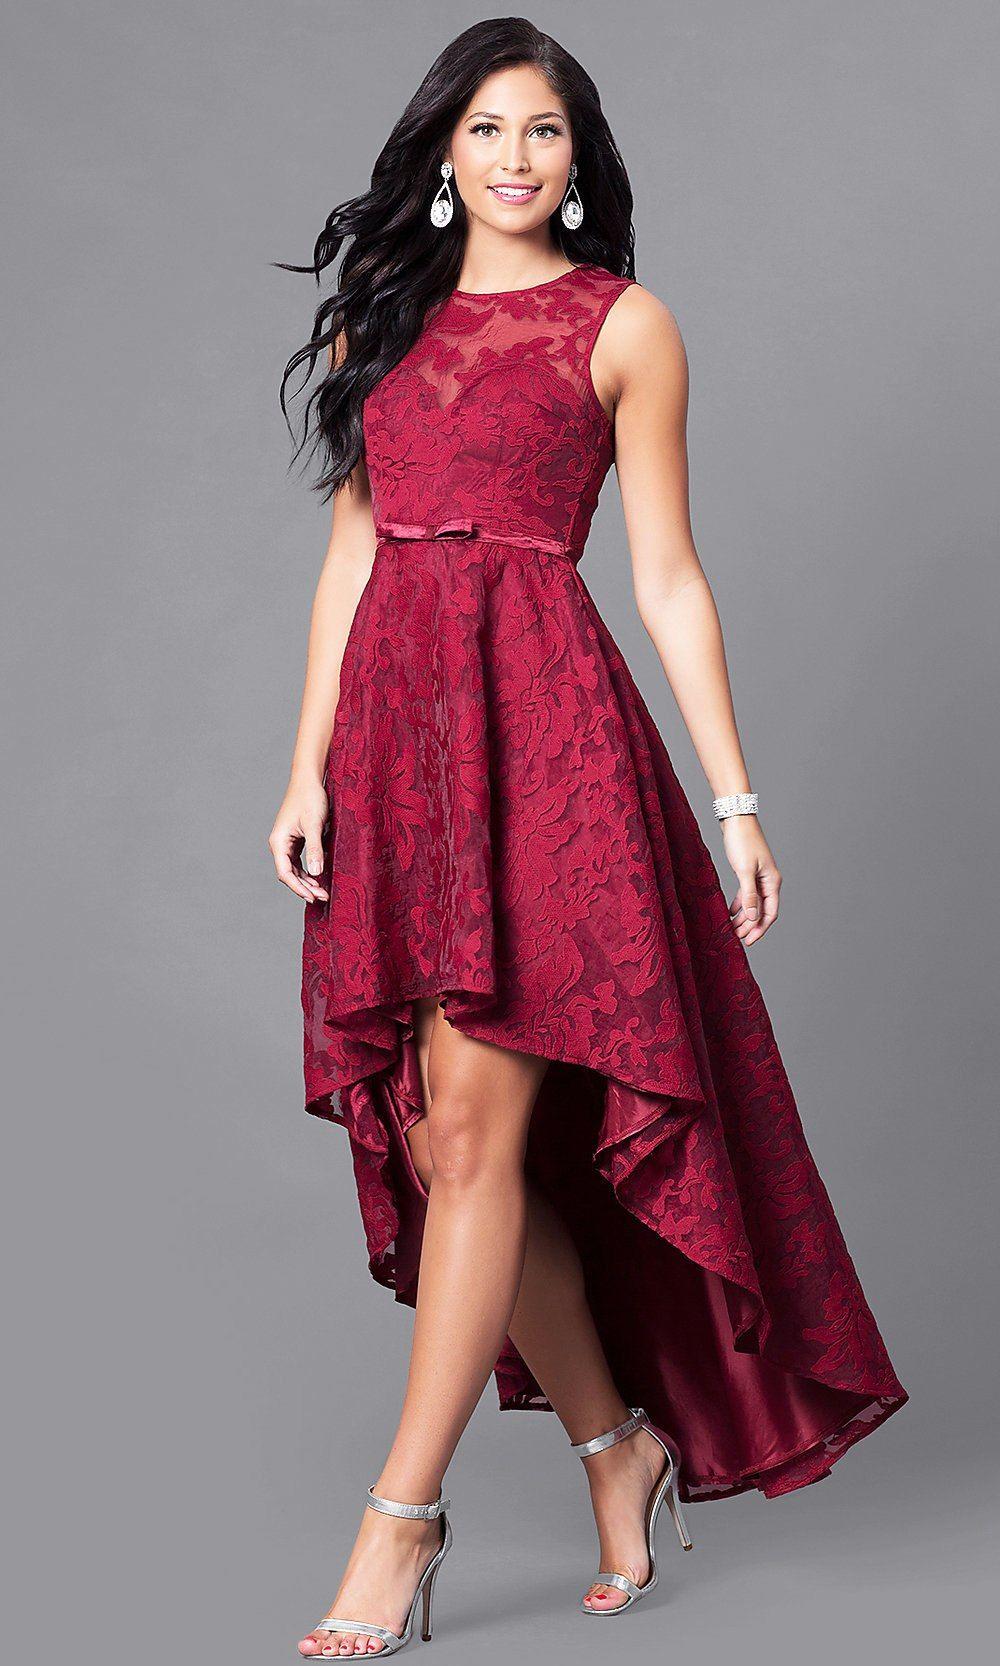 3f3c12bda05 Lace High-Low Sleeveless Semi-Formal Party Dress